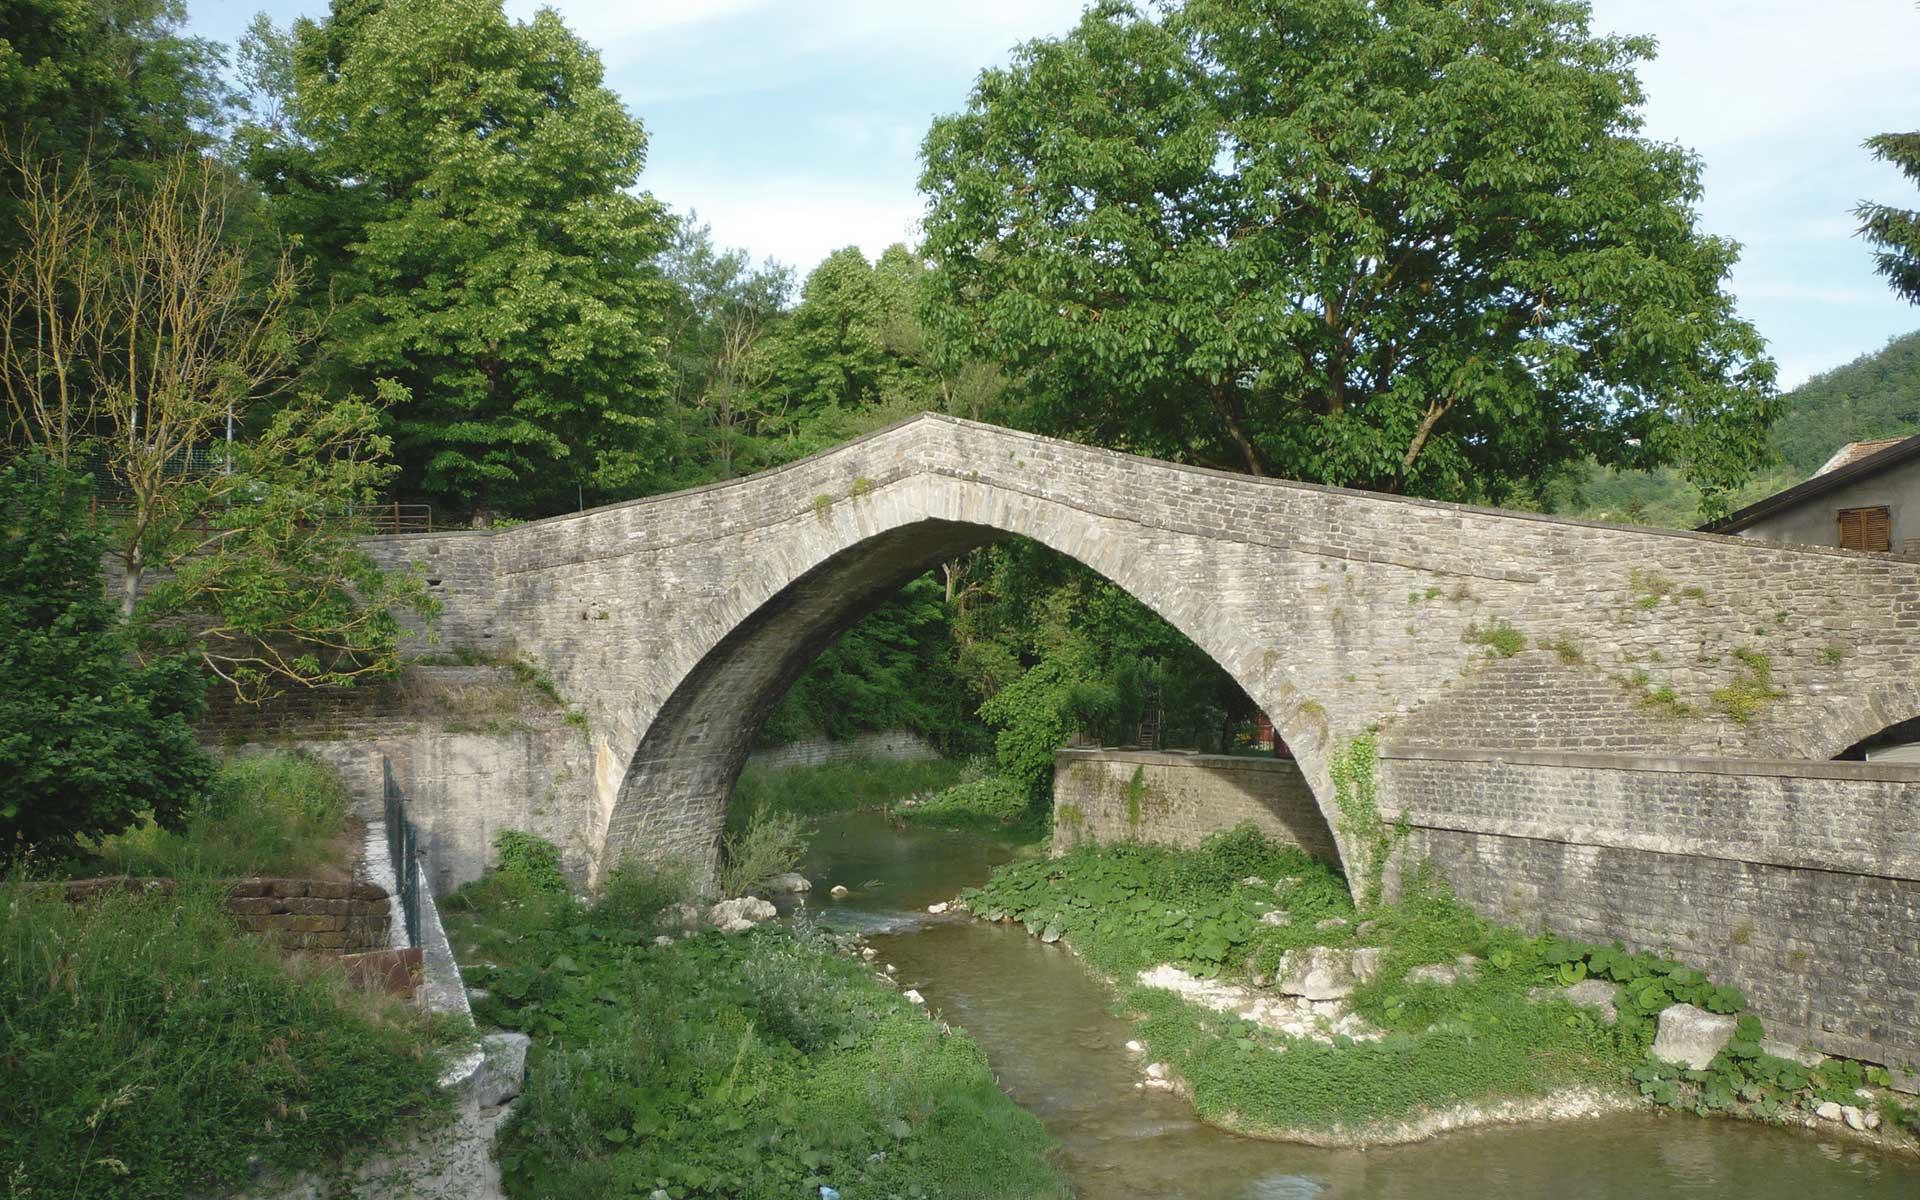 Ponte medioevale a schiena d'asino sec. XIV Apecchio